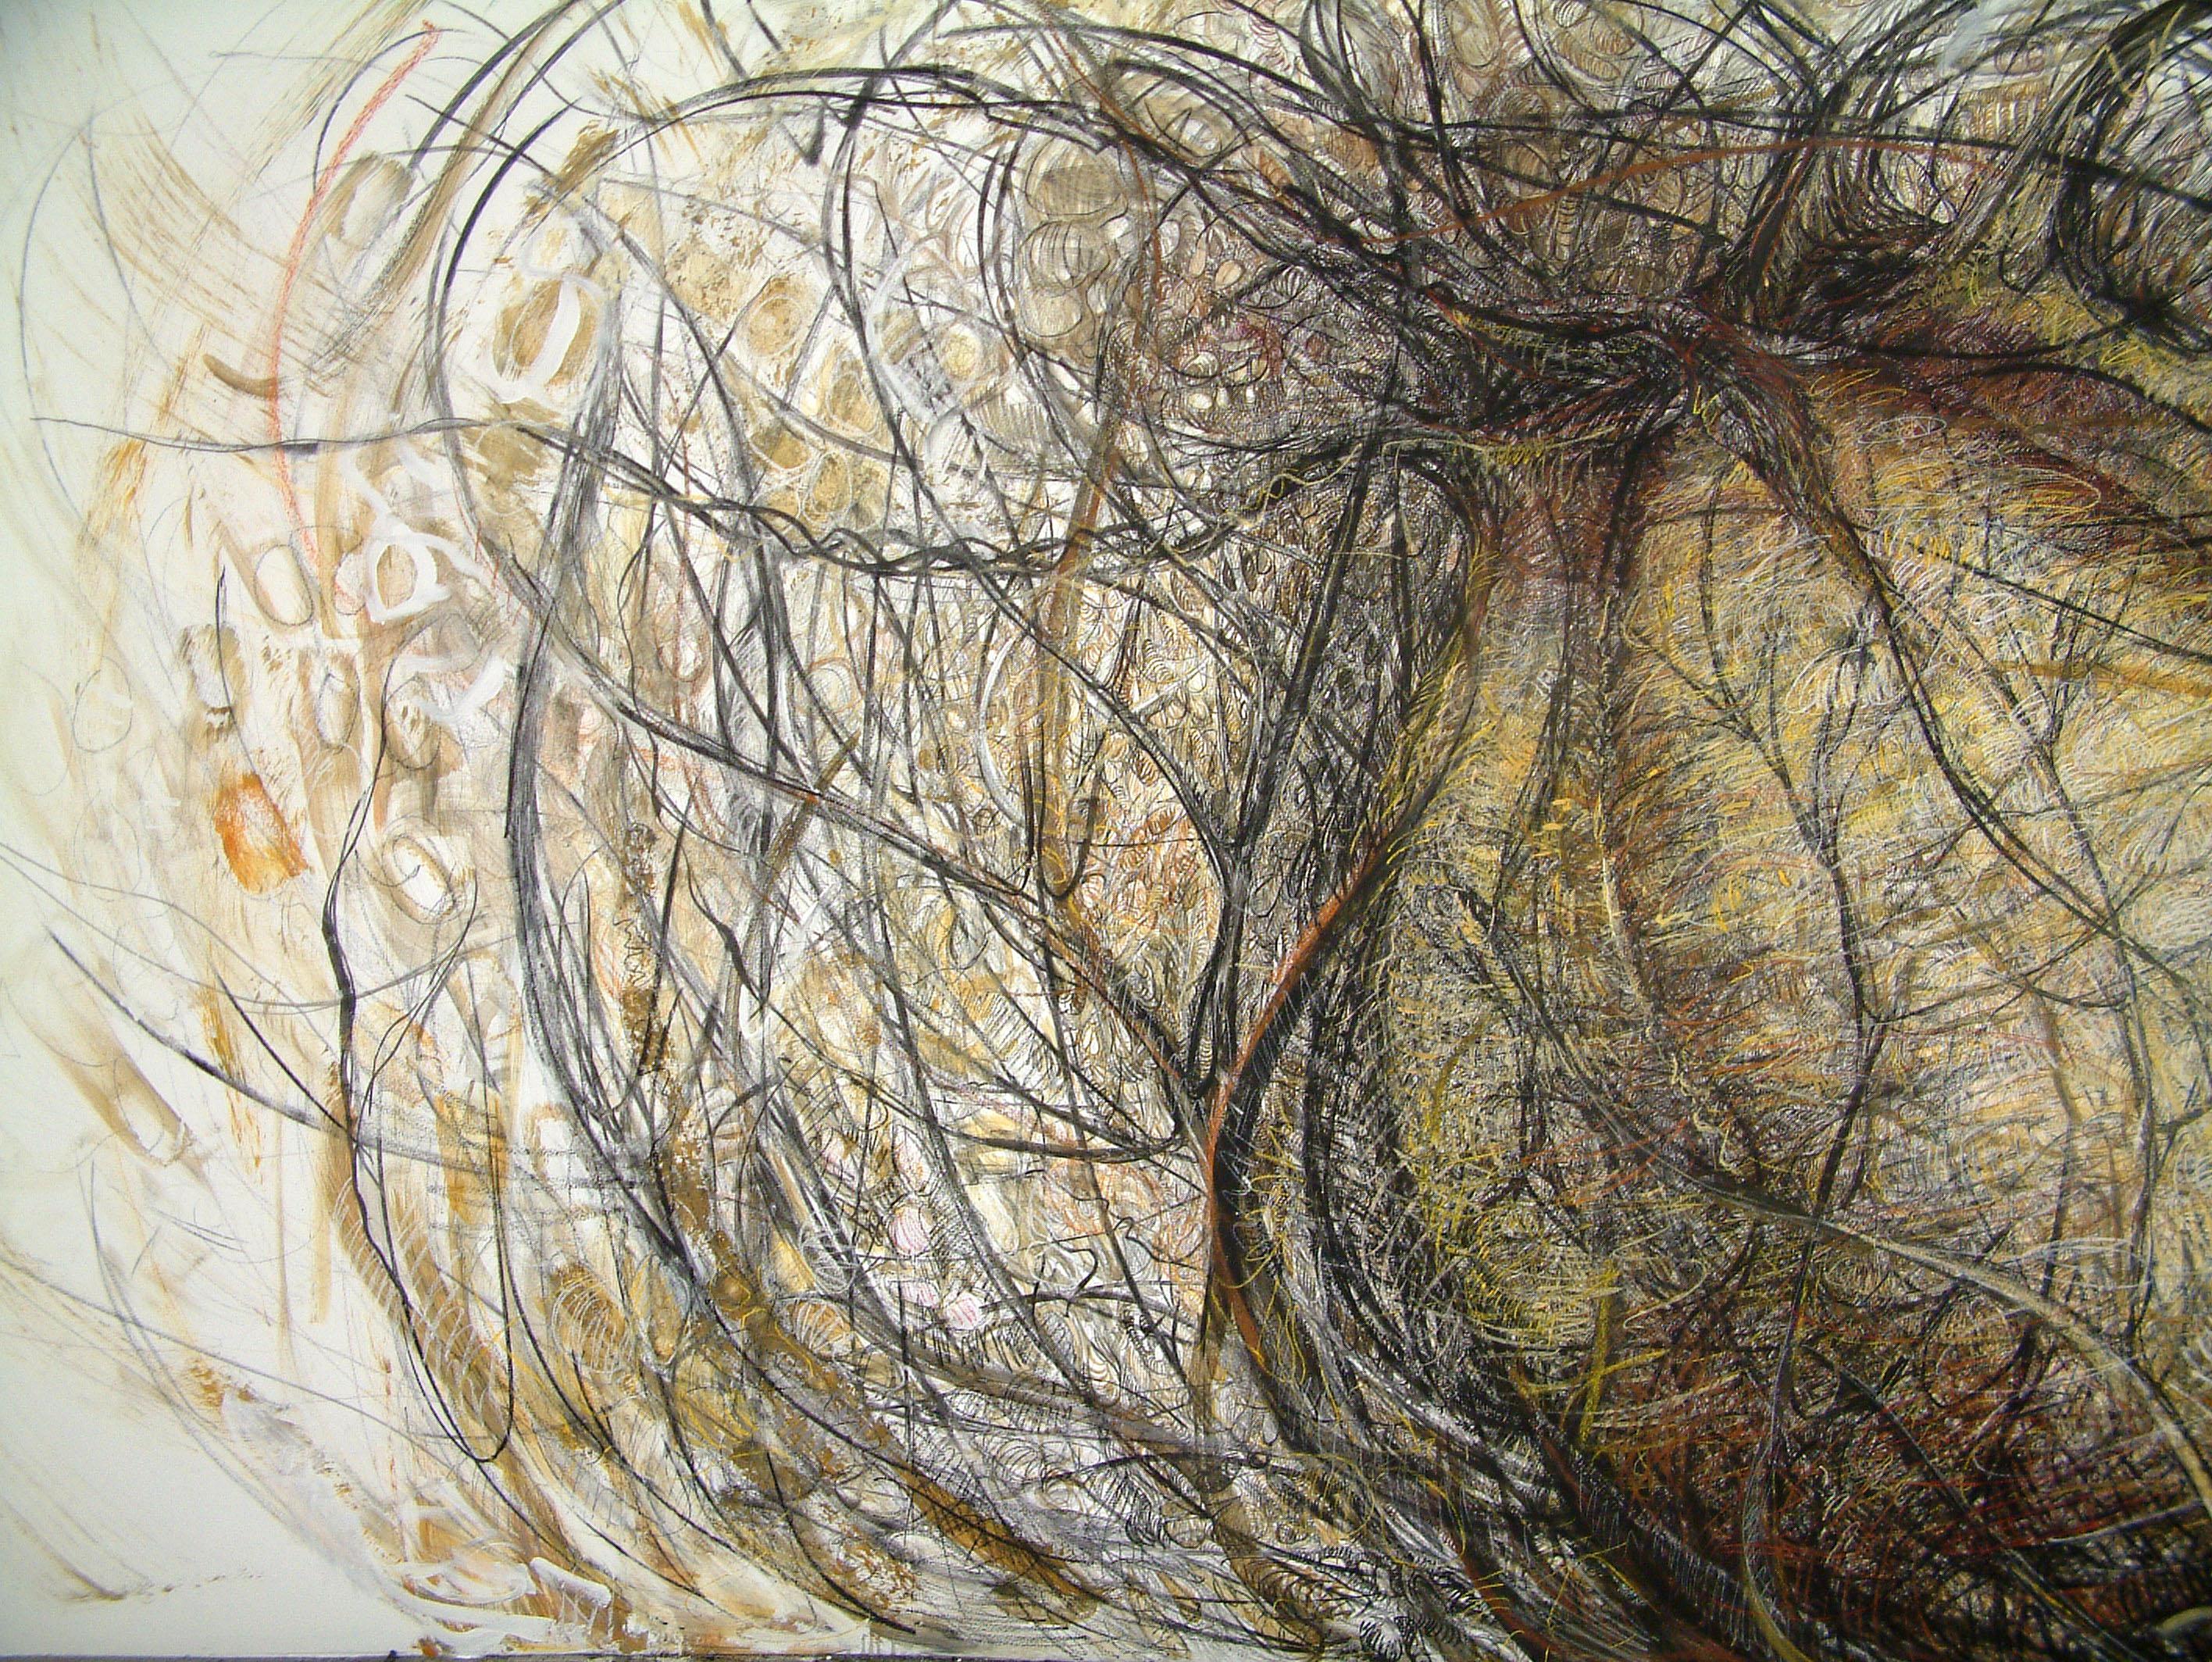 rohini-devasher-copyright-seed-wall-drawing-2004 (6)